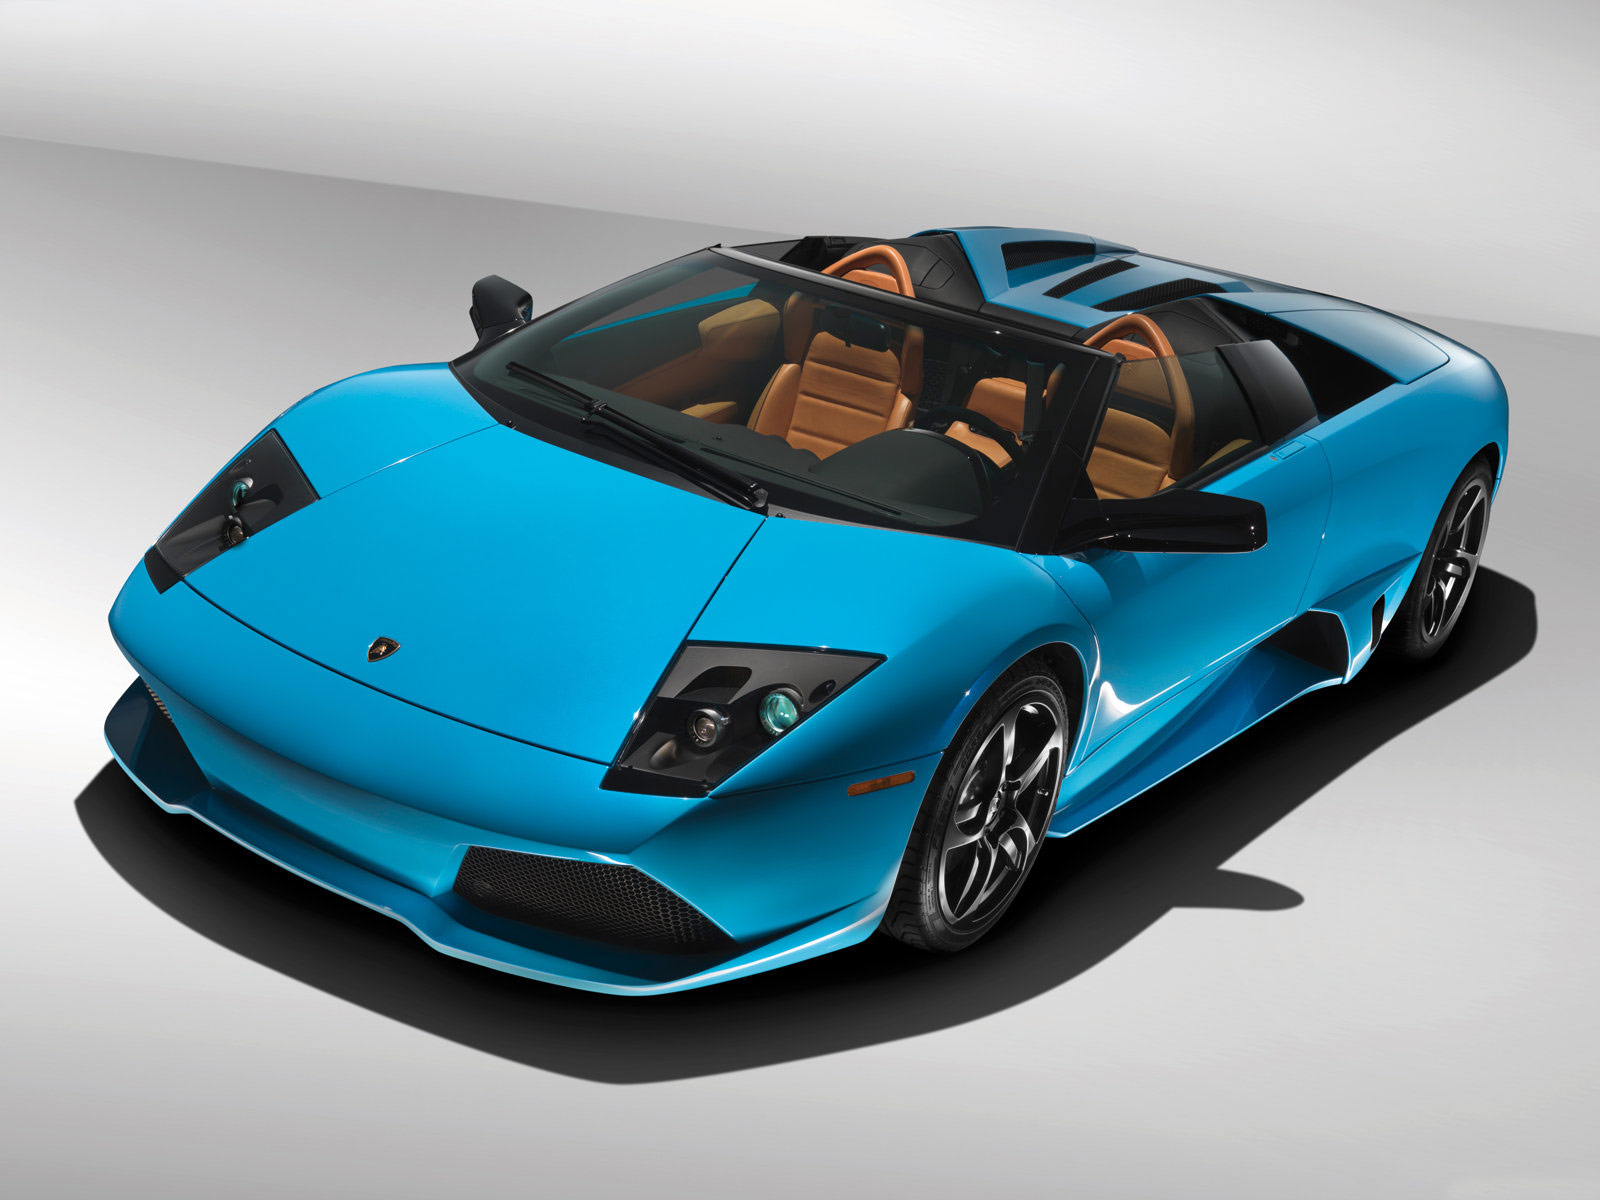 Sports Cars Lamborghini Murcielago Lp640 Wallpaper